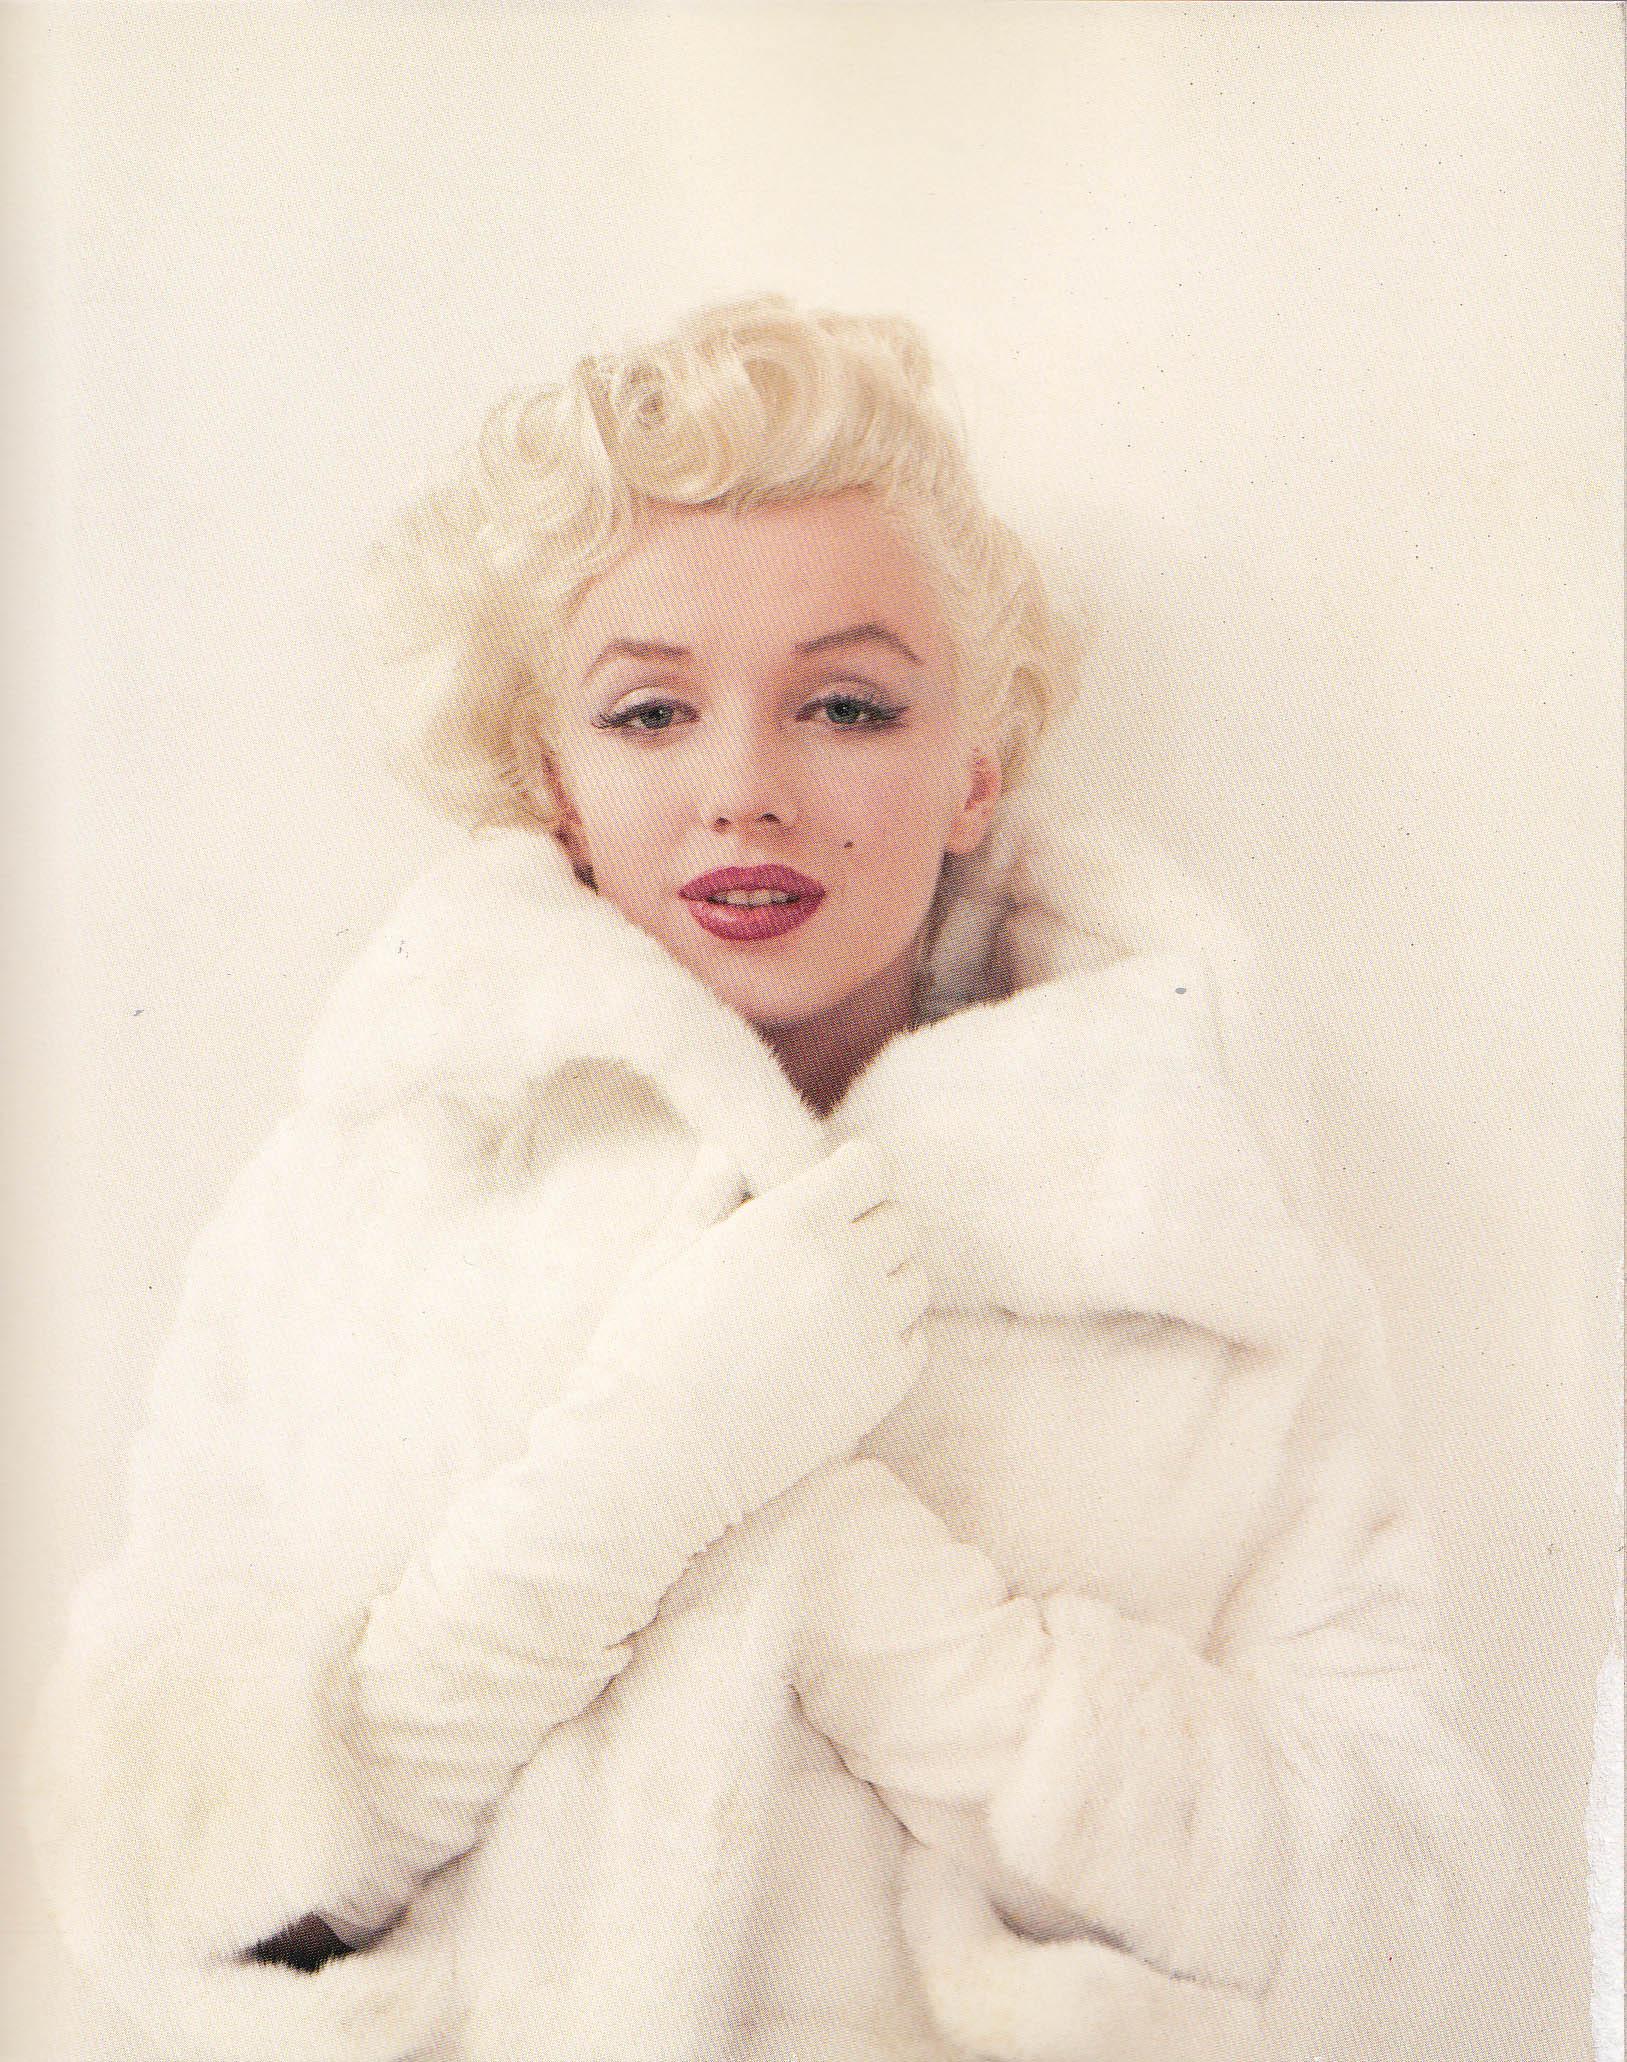 Marilyn Monroe Living Room Decor: Marilyn's Makeup Secrets – Part 2 The Tips